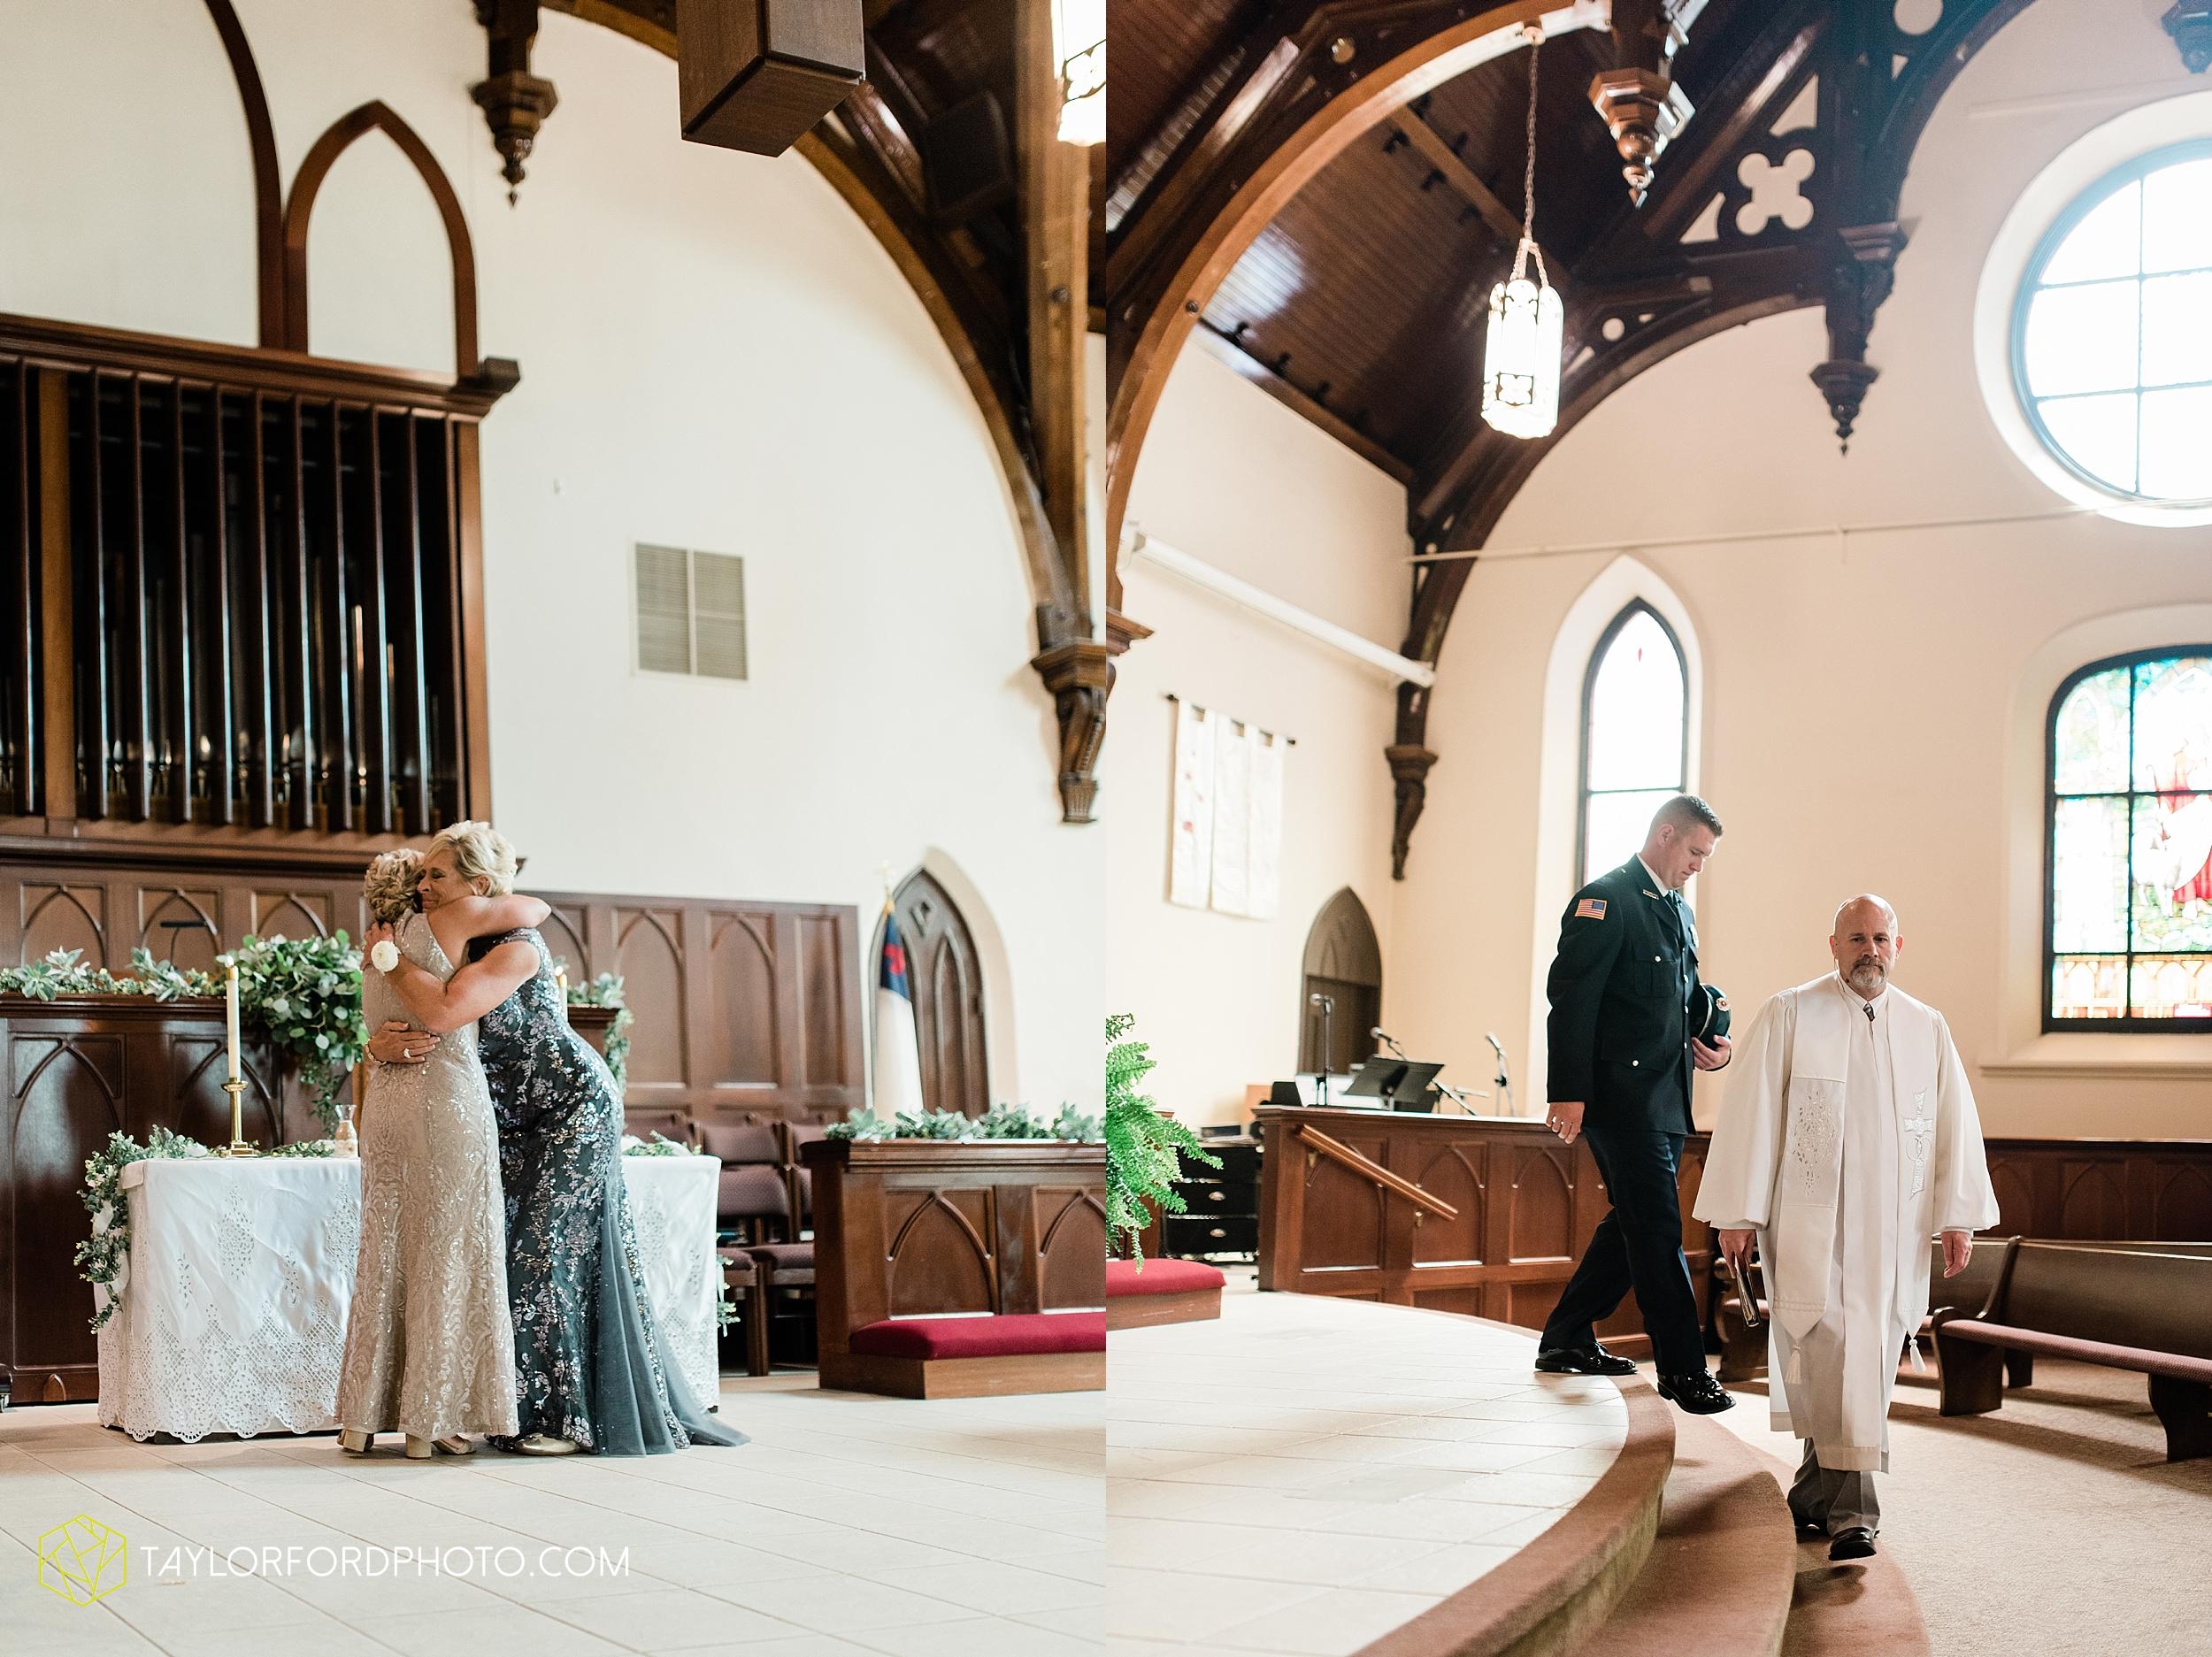 van-wert-ohio-first-united-methodist-church-county-dairy-barn-wedding-photographer-taylor-ford-photography_9824.jpg